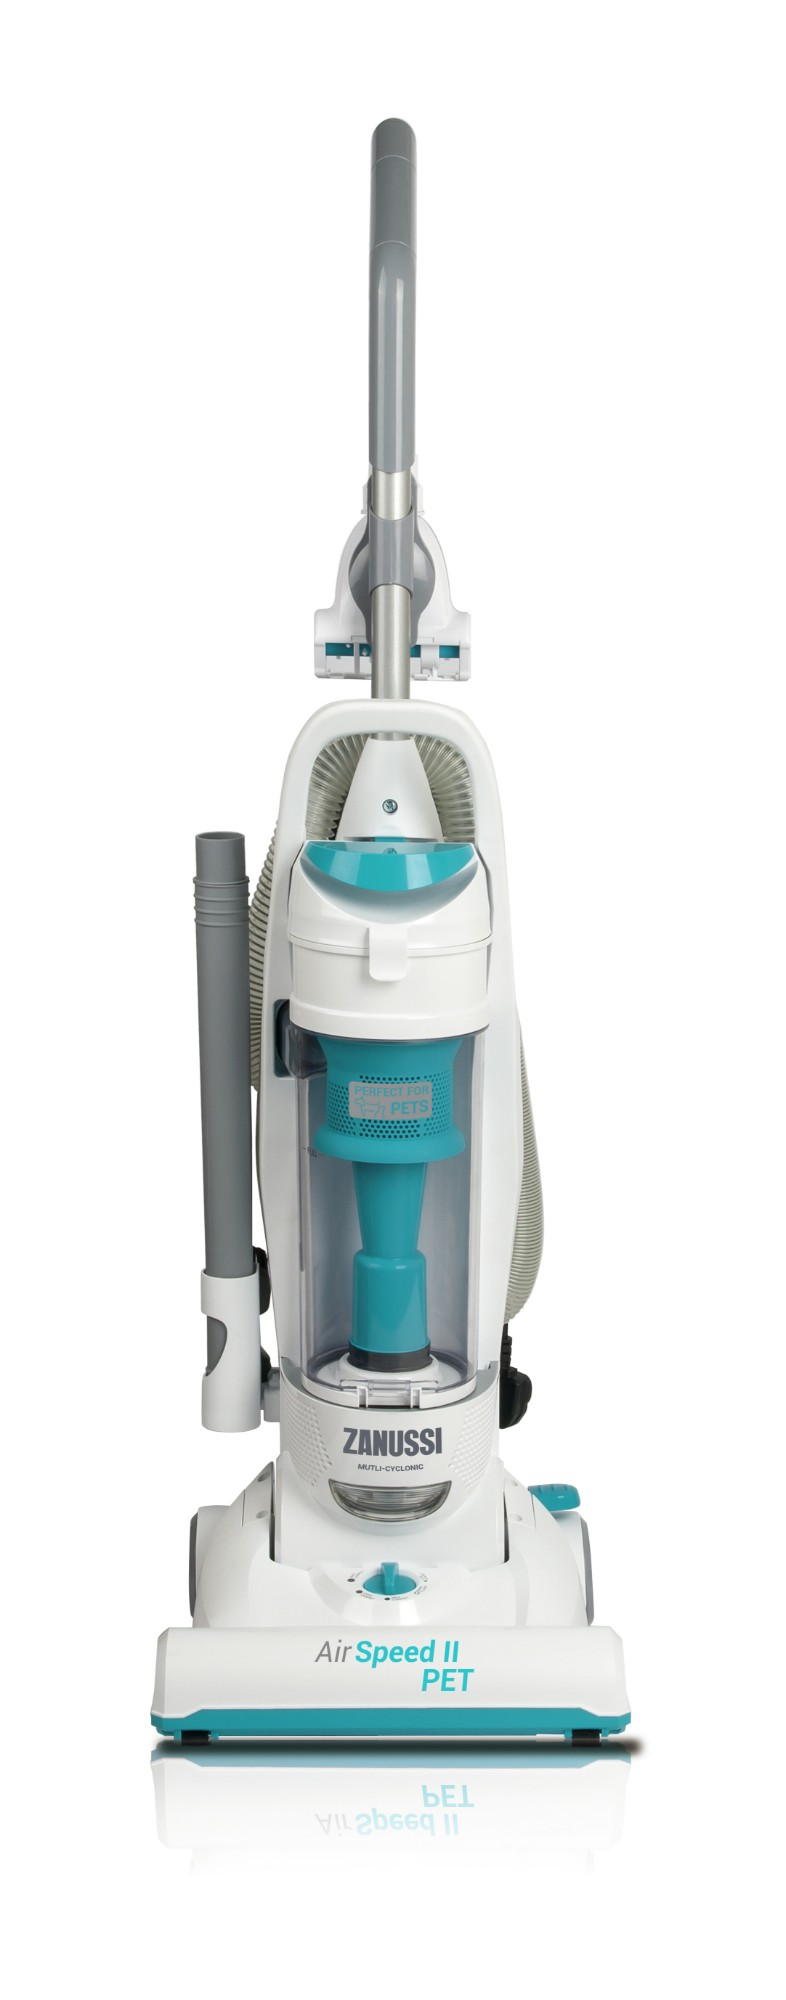 Zanussi ZAN2021PT stick vacuum/electric broom Bagless 3.5 L Black, Grey, White